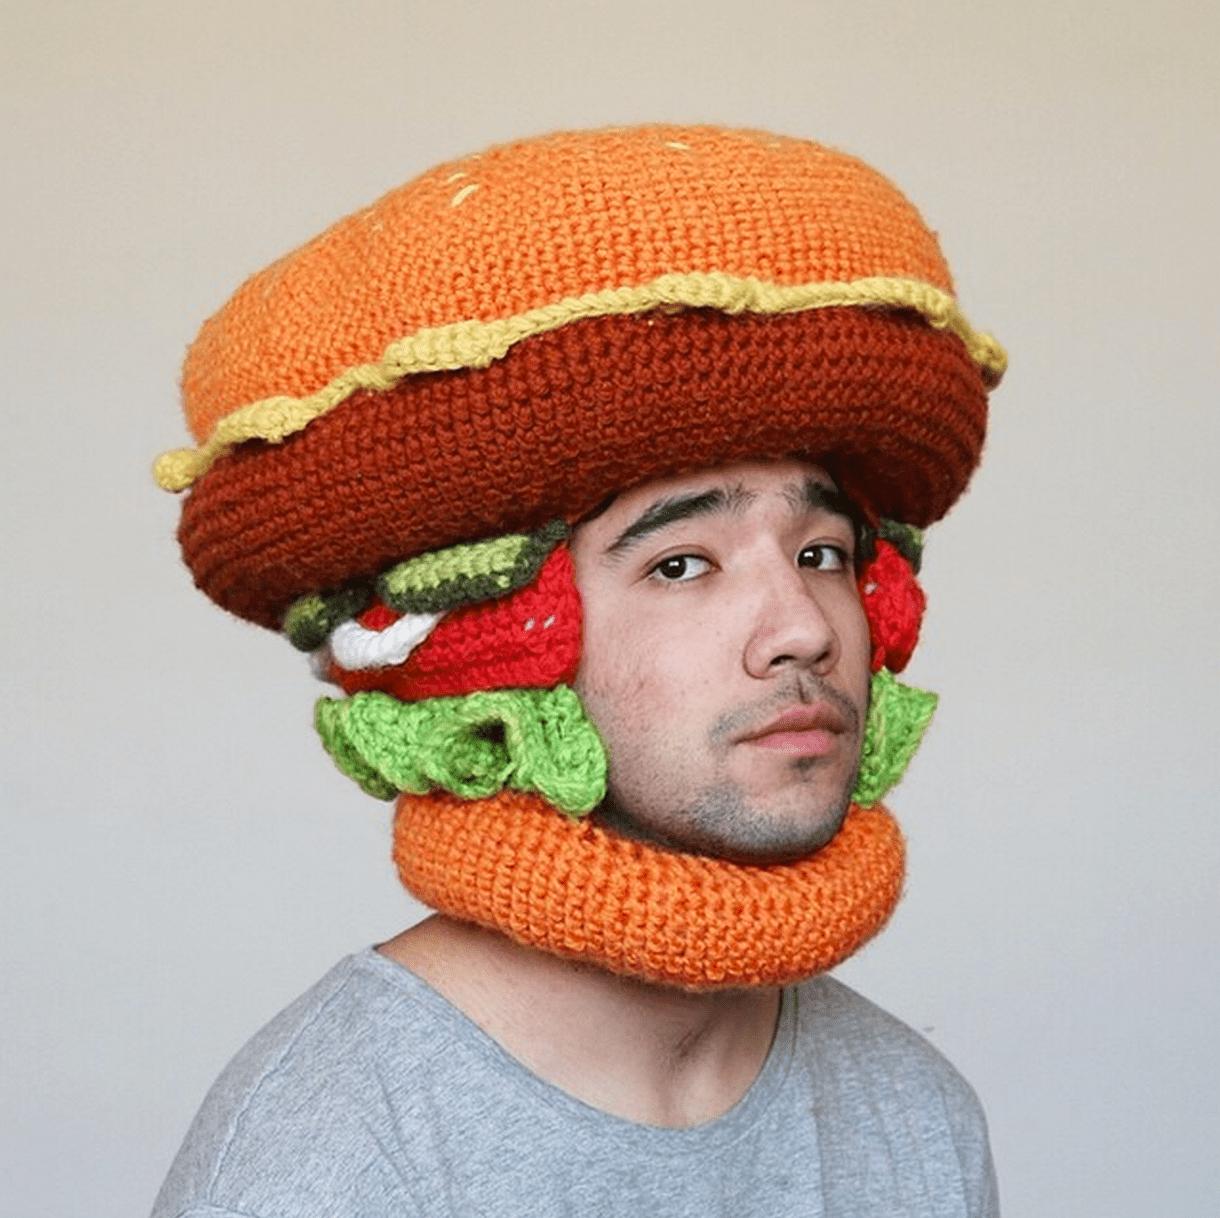 Fantastic Crocheted Food Hats